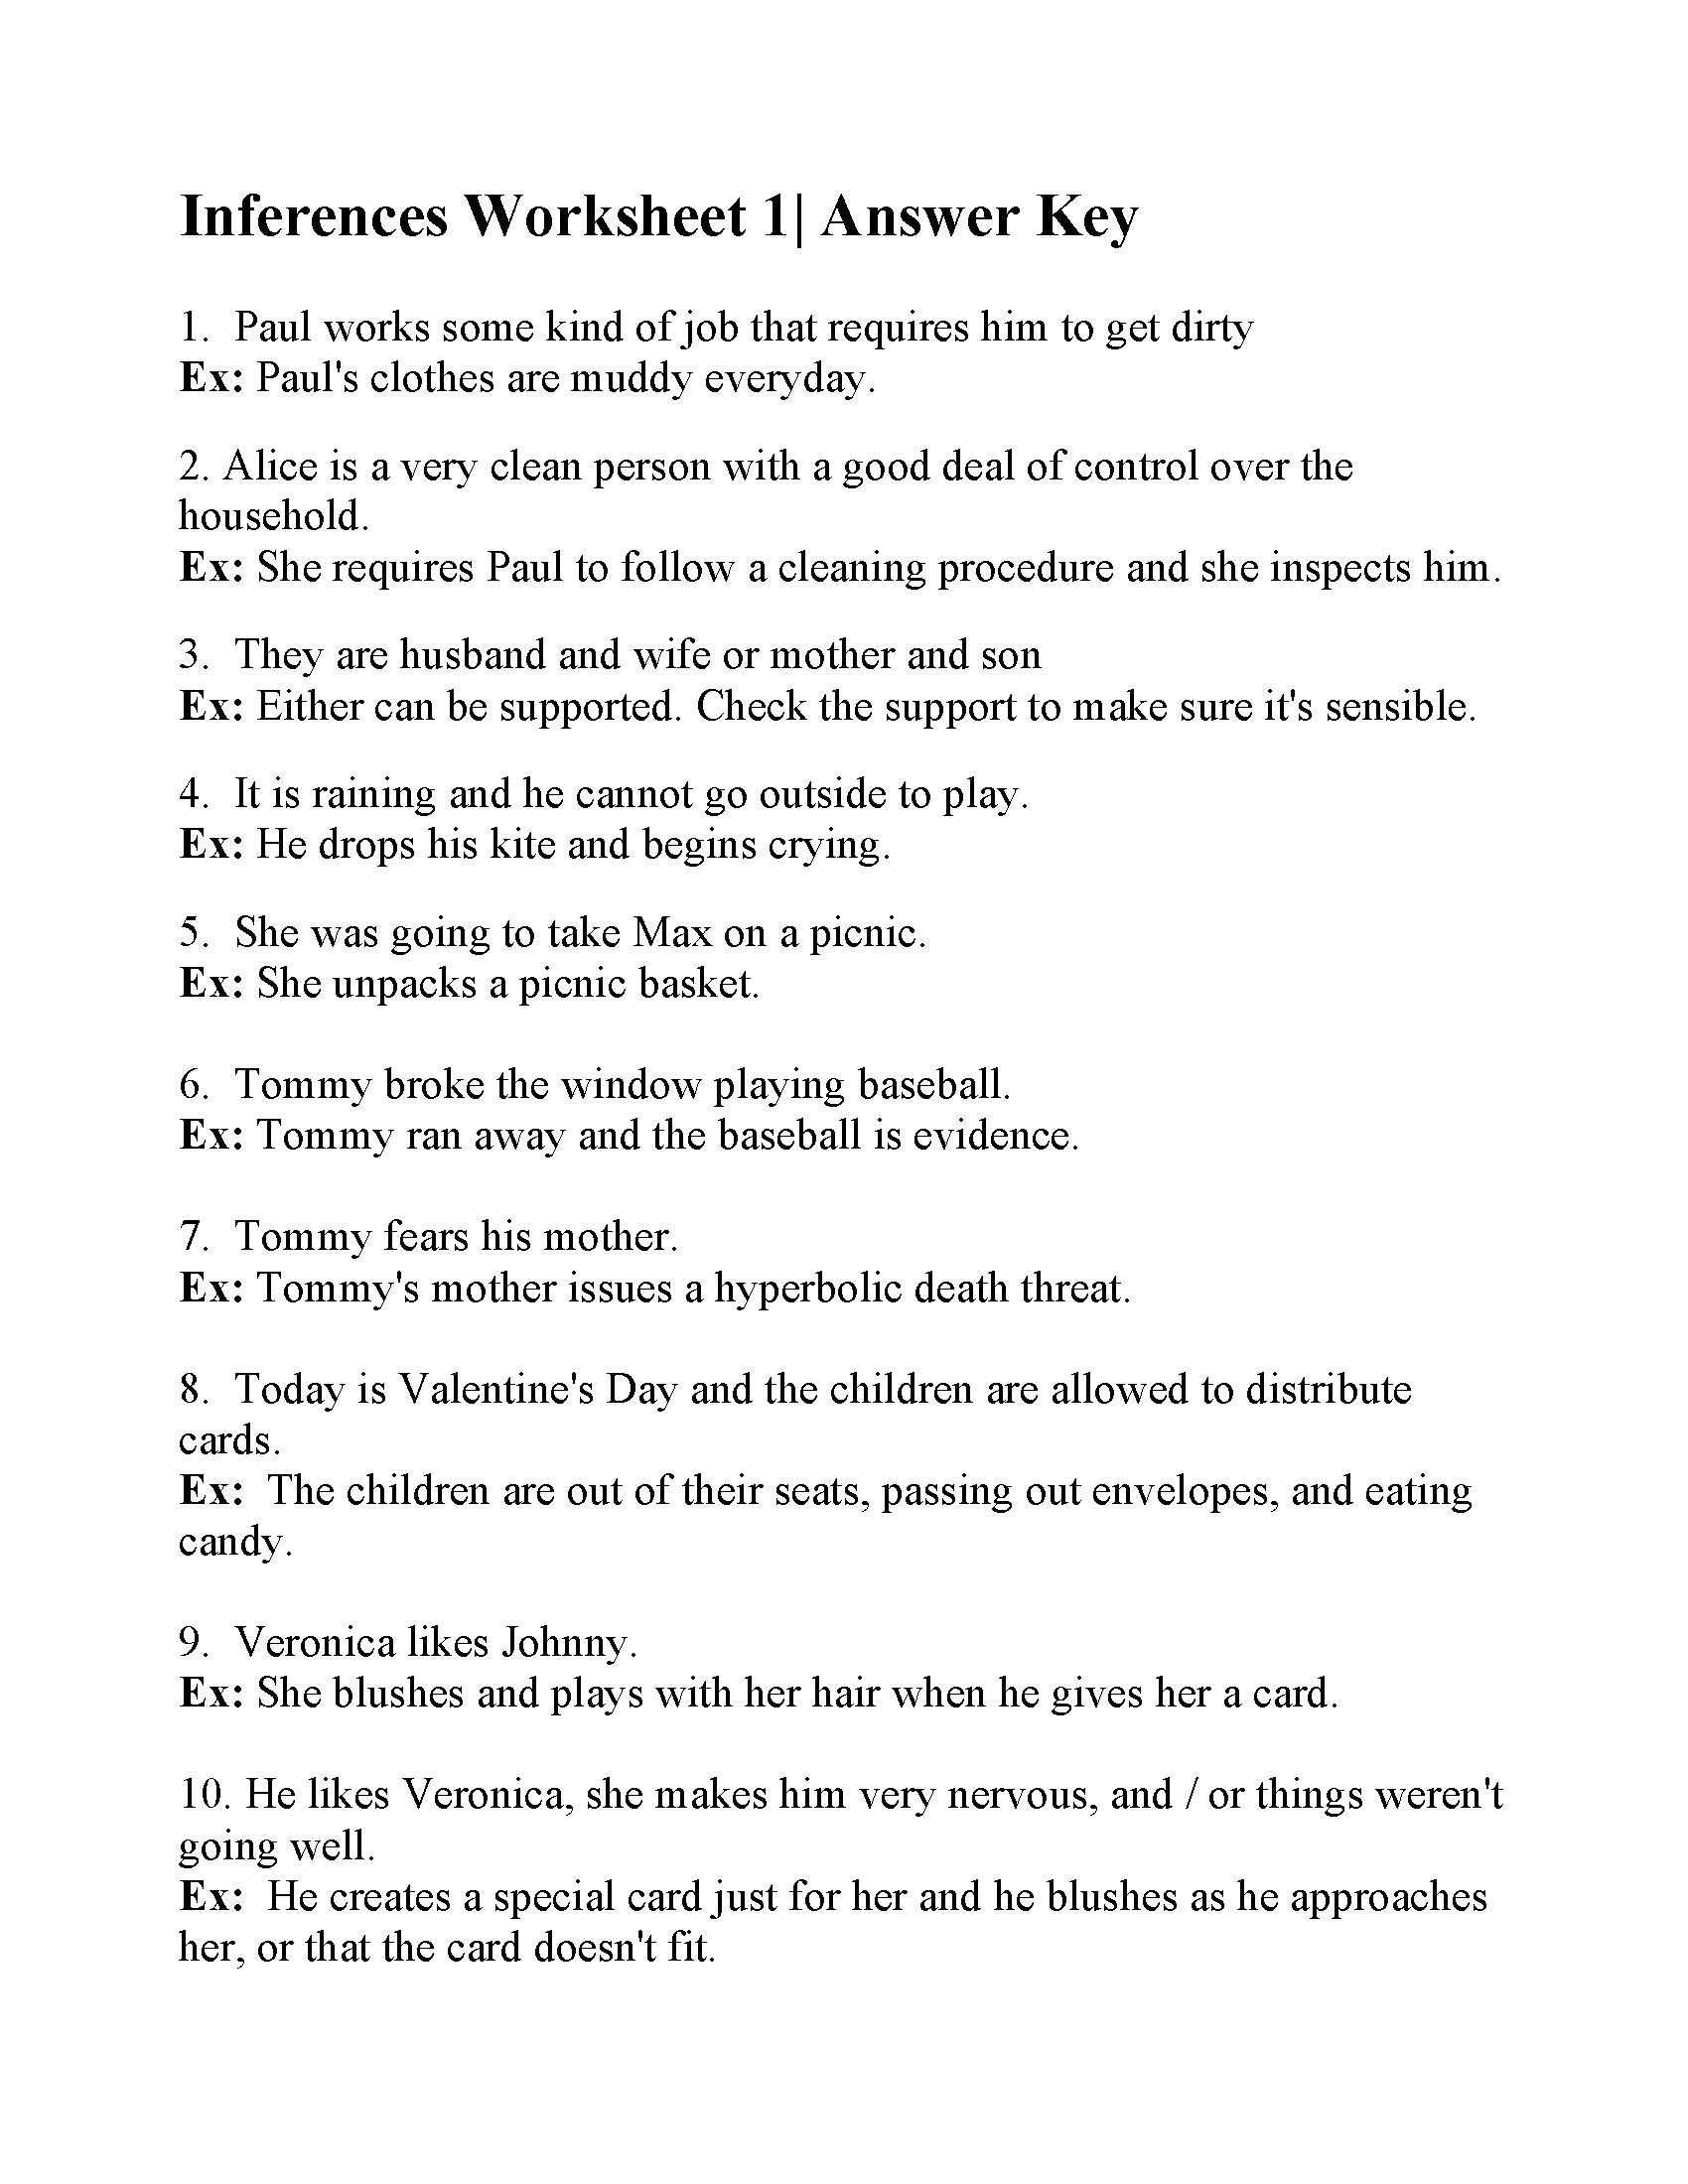 Making Inference Worksheets 4th Grade Inferences Worksheet 1